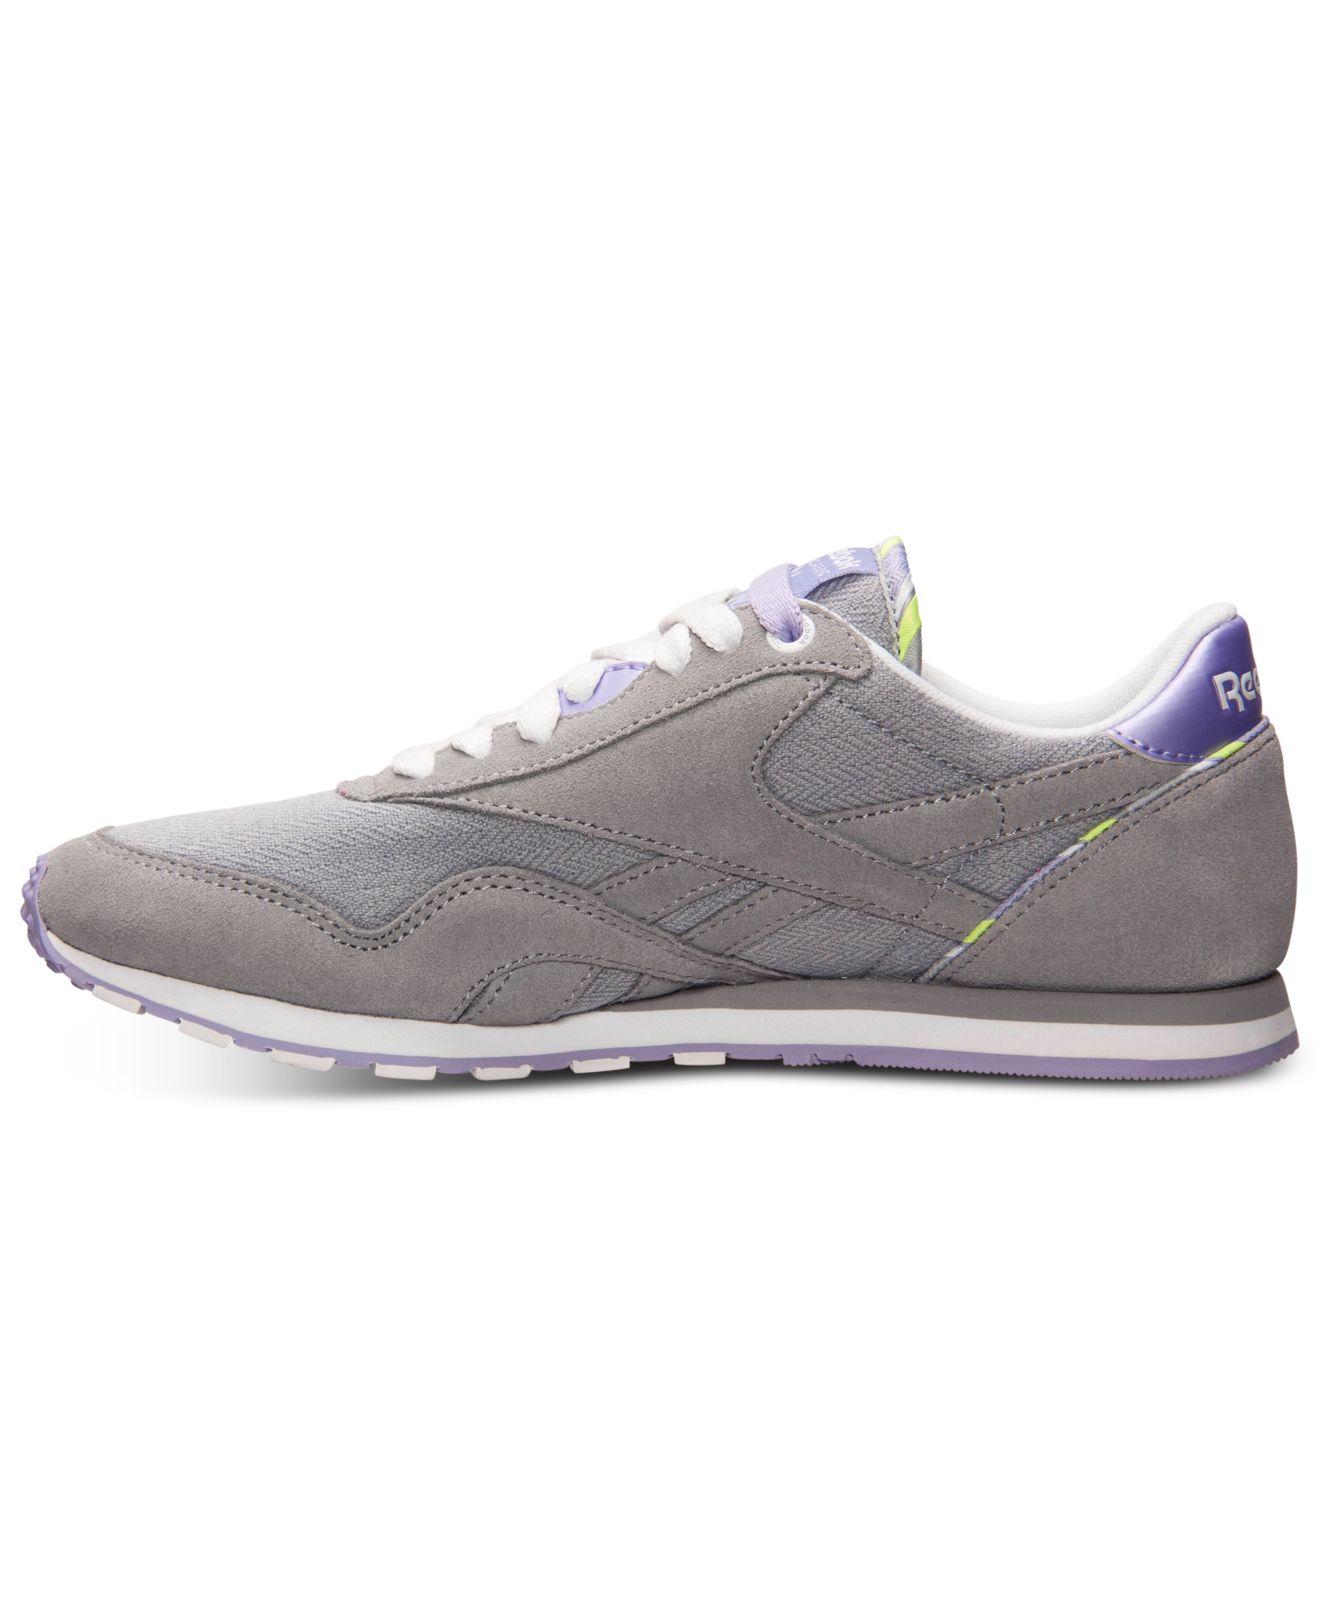 7af6342a0d0 Lyst - Reebok Women s Classic Nylon Slim Jacquard Casual Sneakers ...